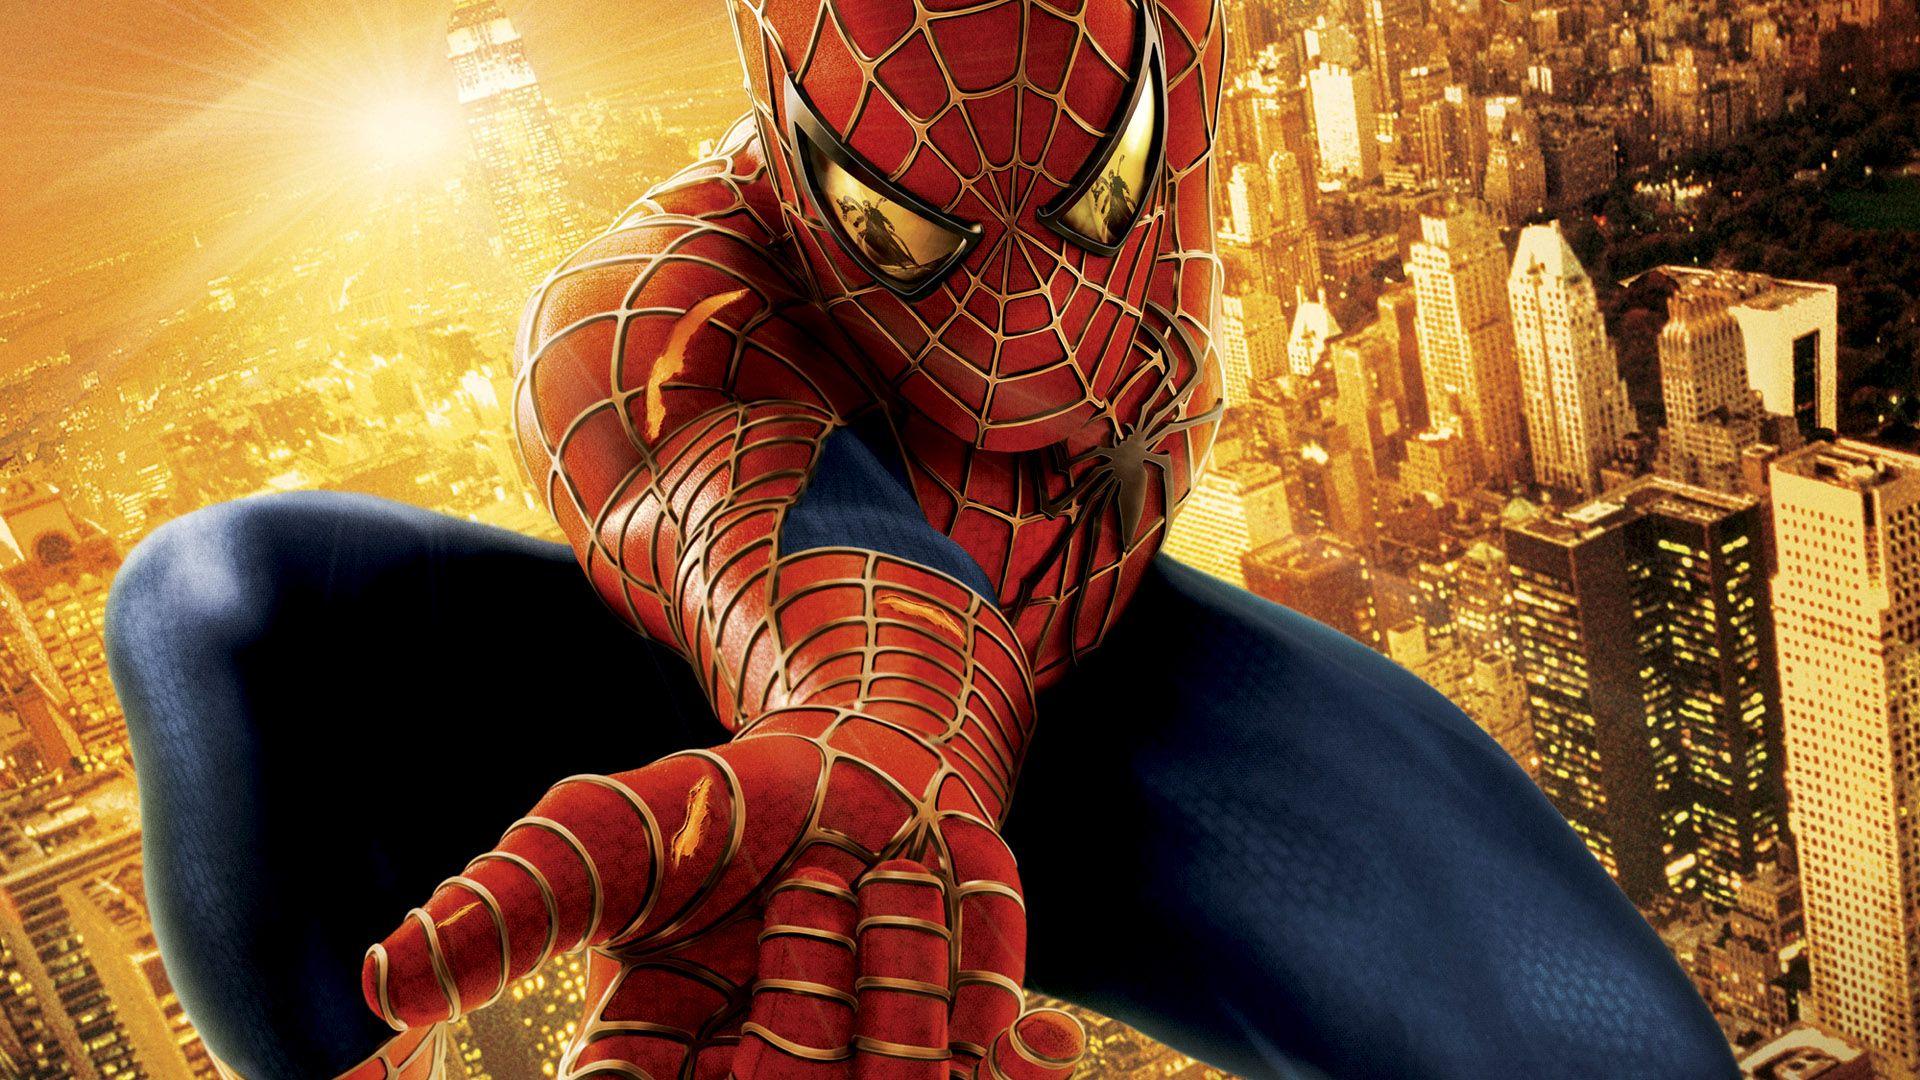 Spajdermen Spiderman